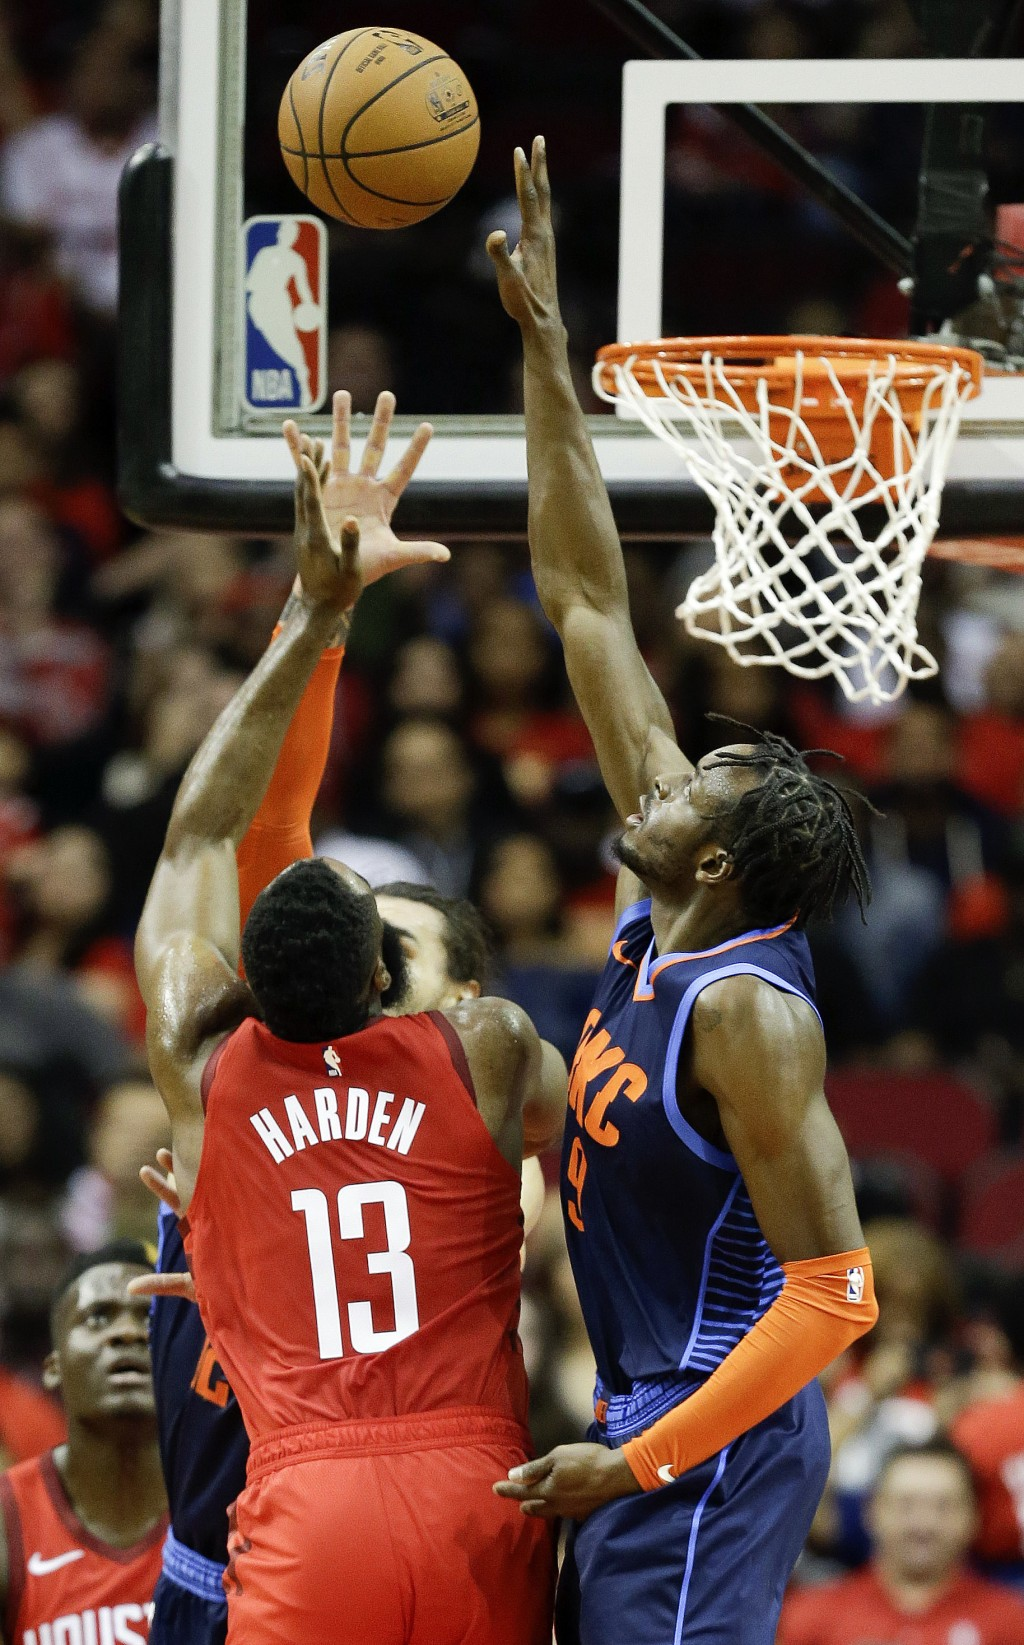 Oklahoma City Thunder forward Jerami Grant, right, blocks the shot of Houston Rockets guard James Harden (13) during the first half of an NBA basketba...